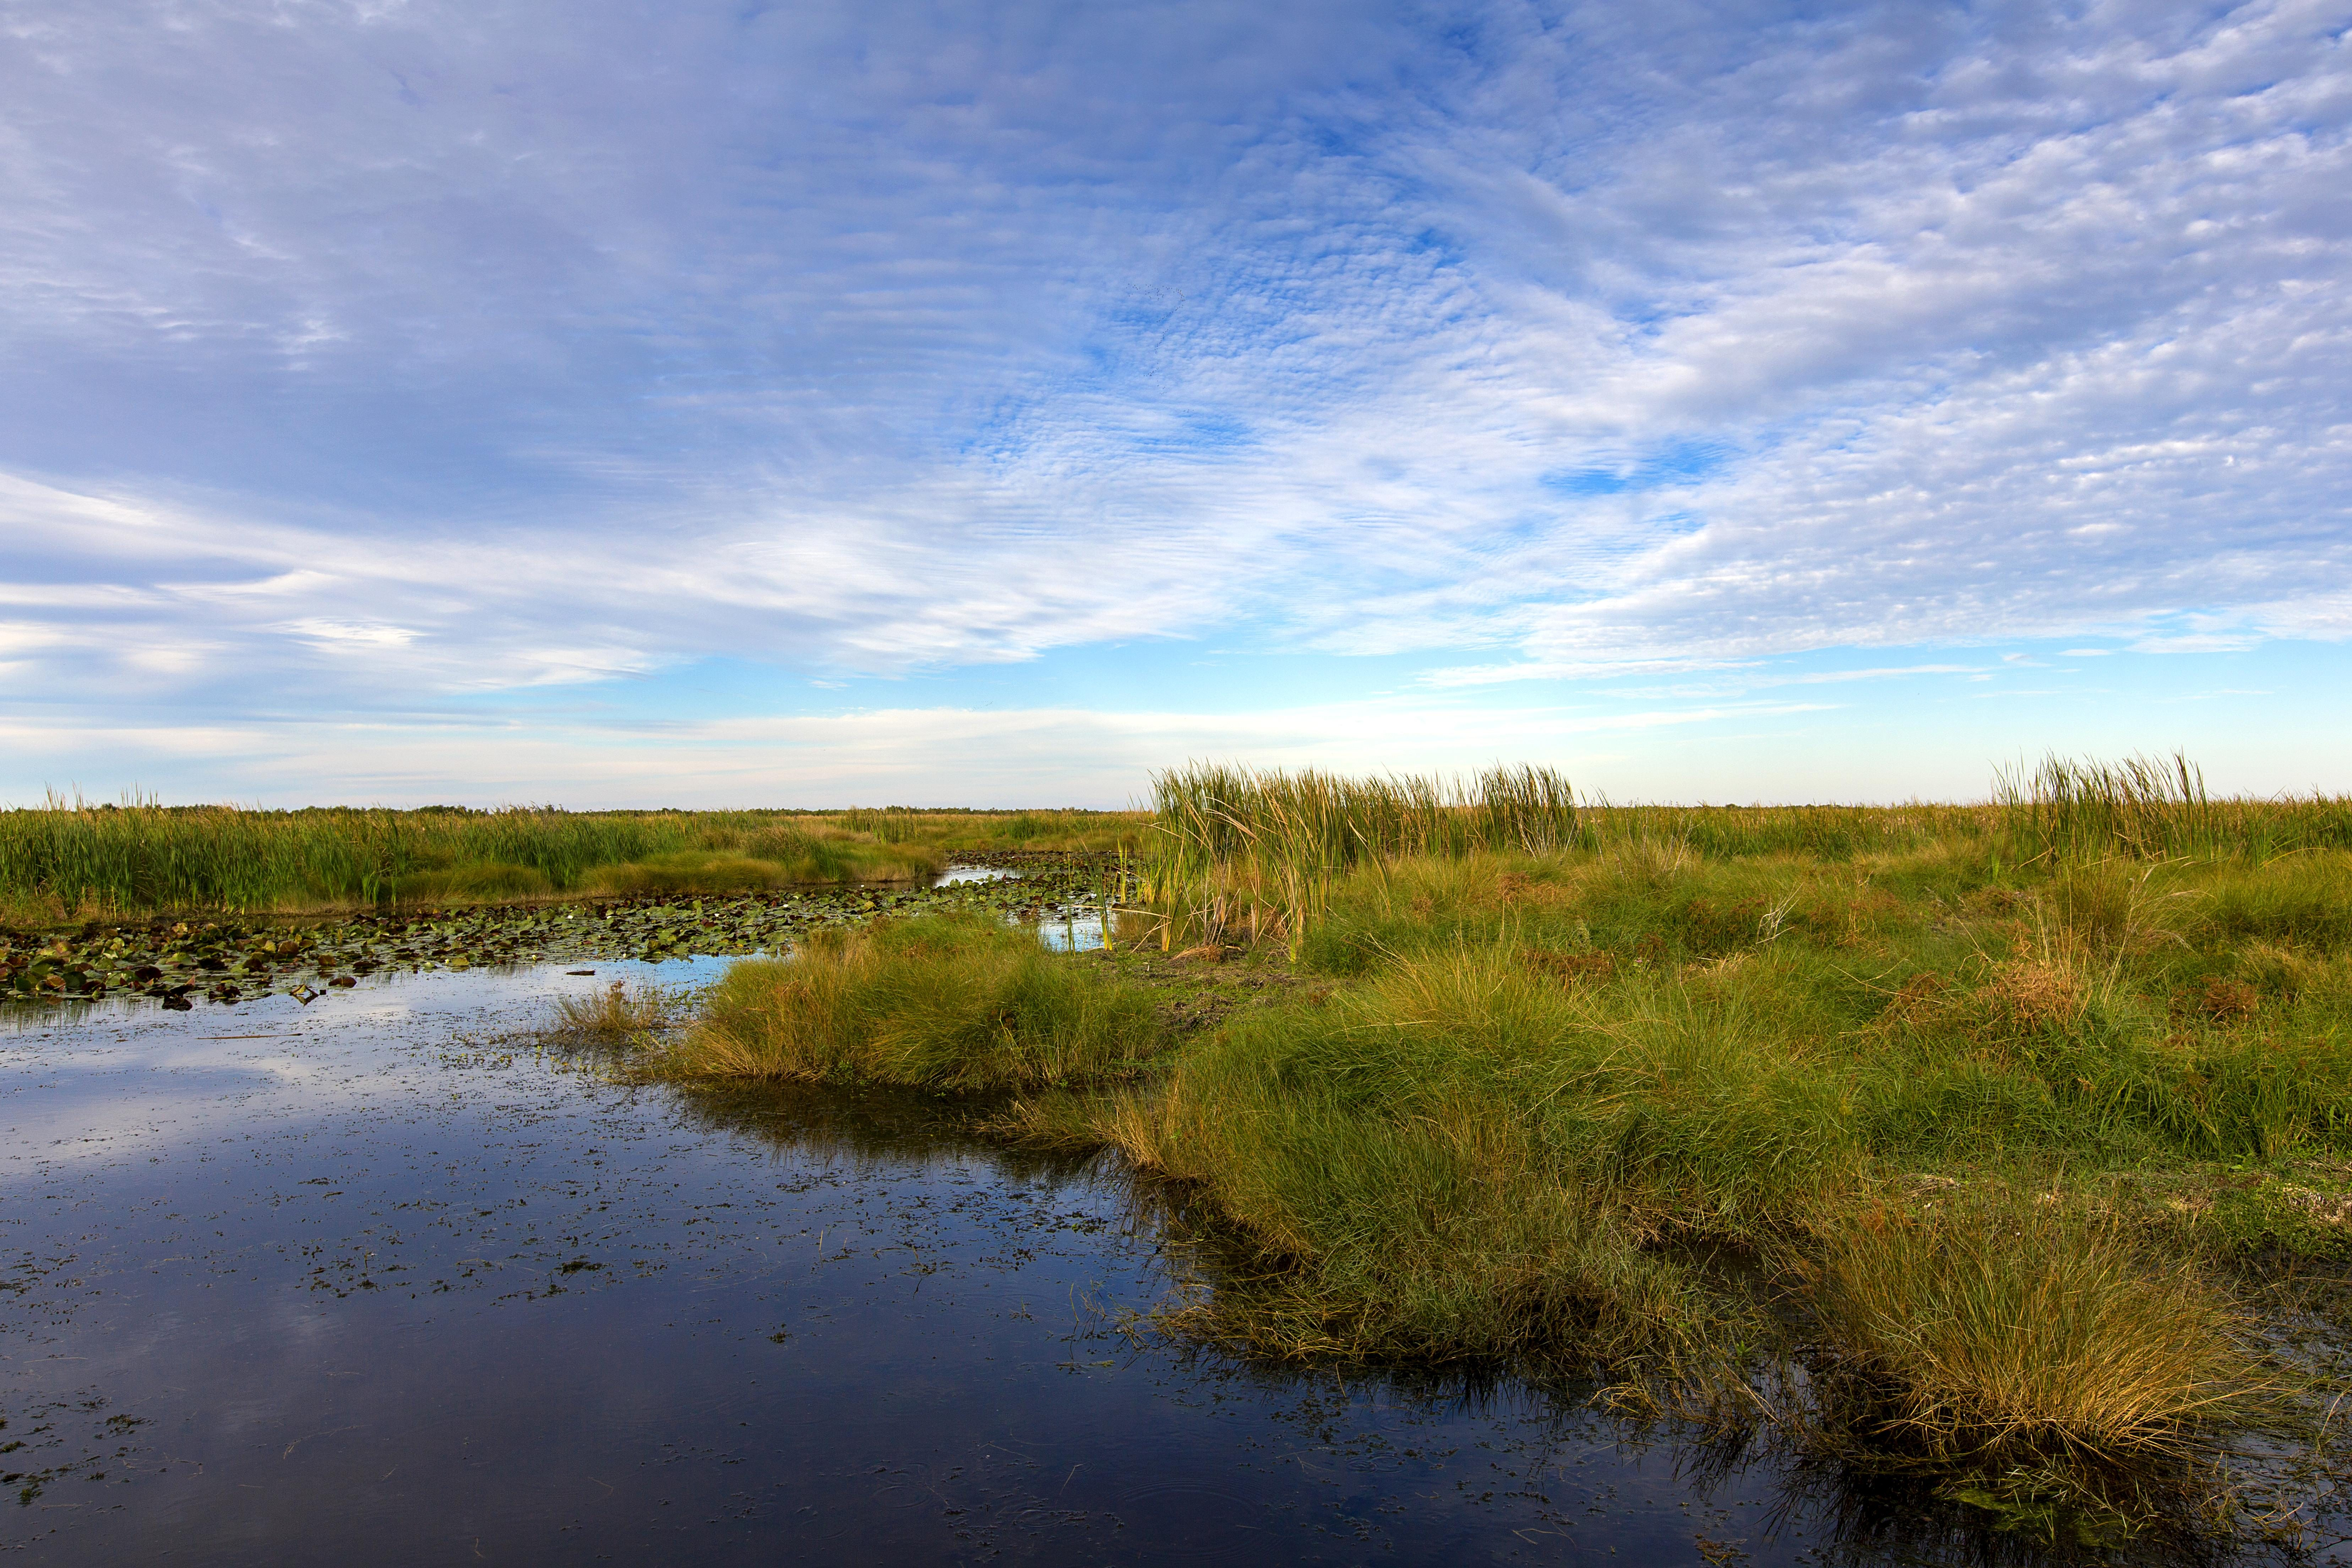 Free photograph; bayou, Sauvage, national, wildlife, refuge, Orleans, Louisiana